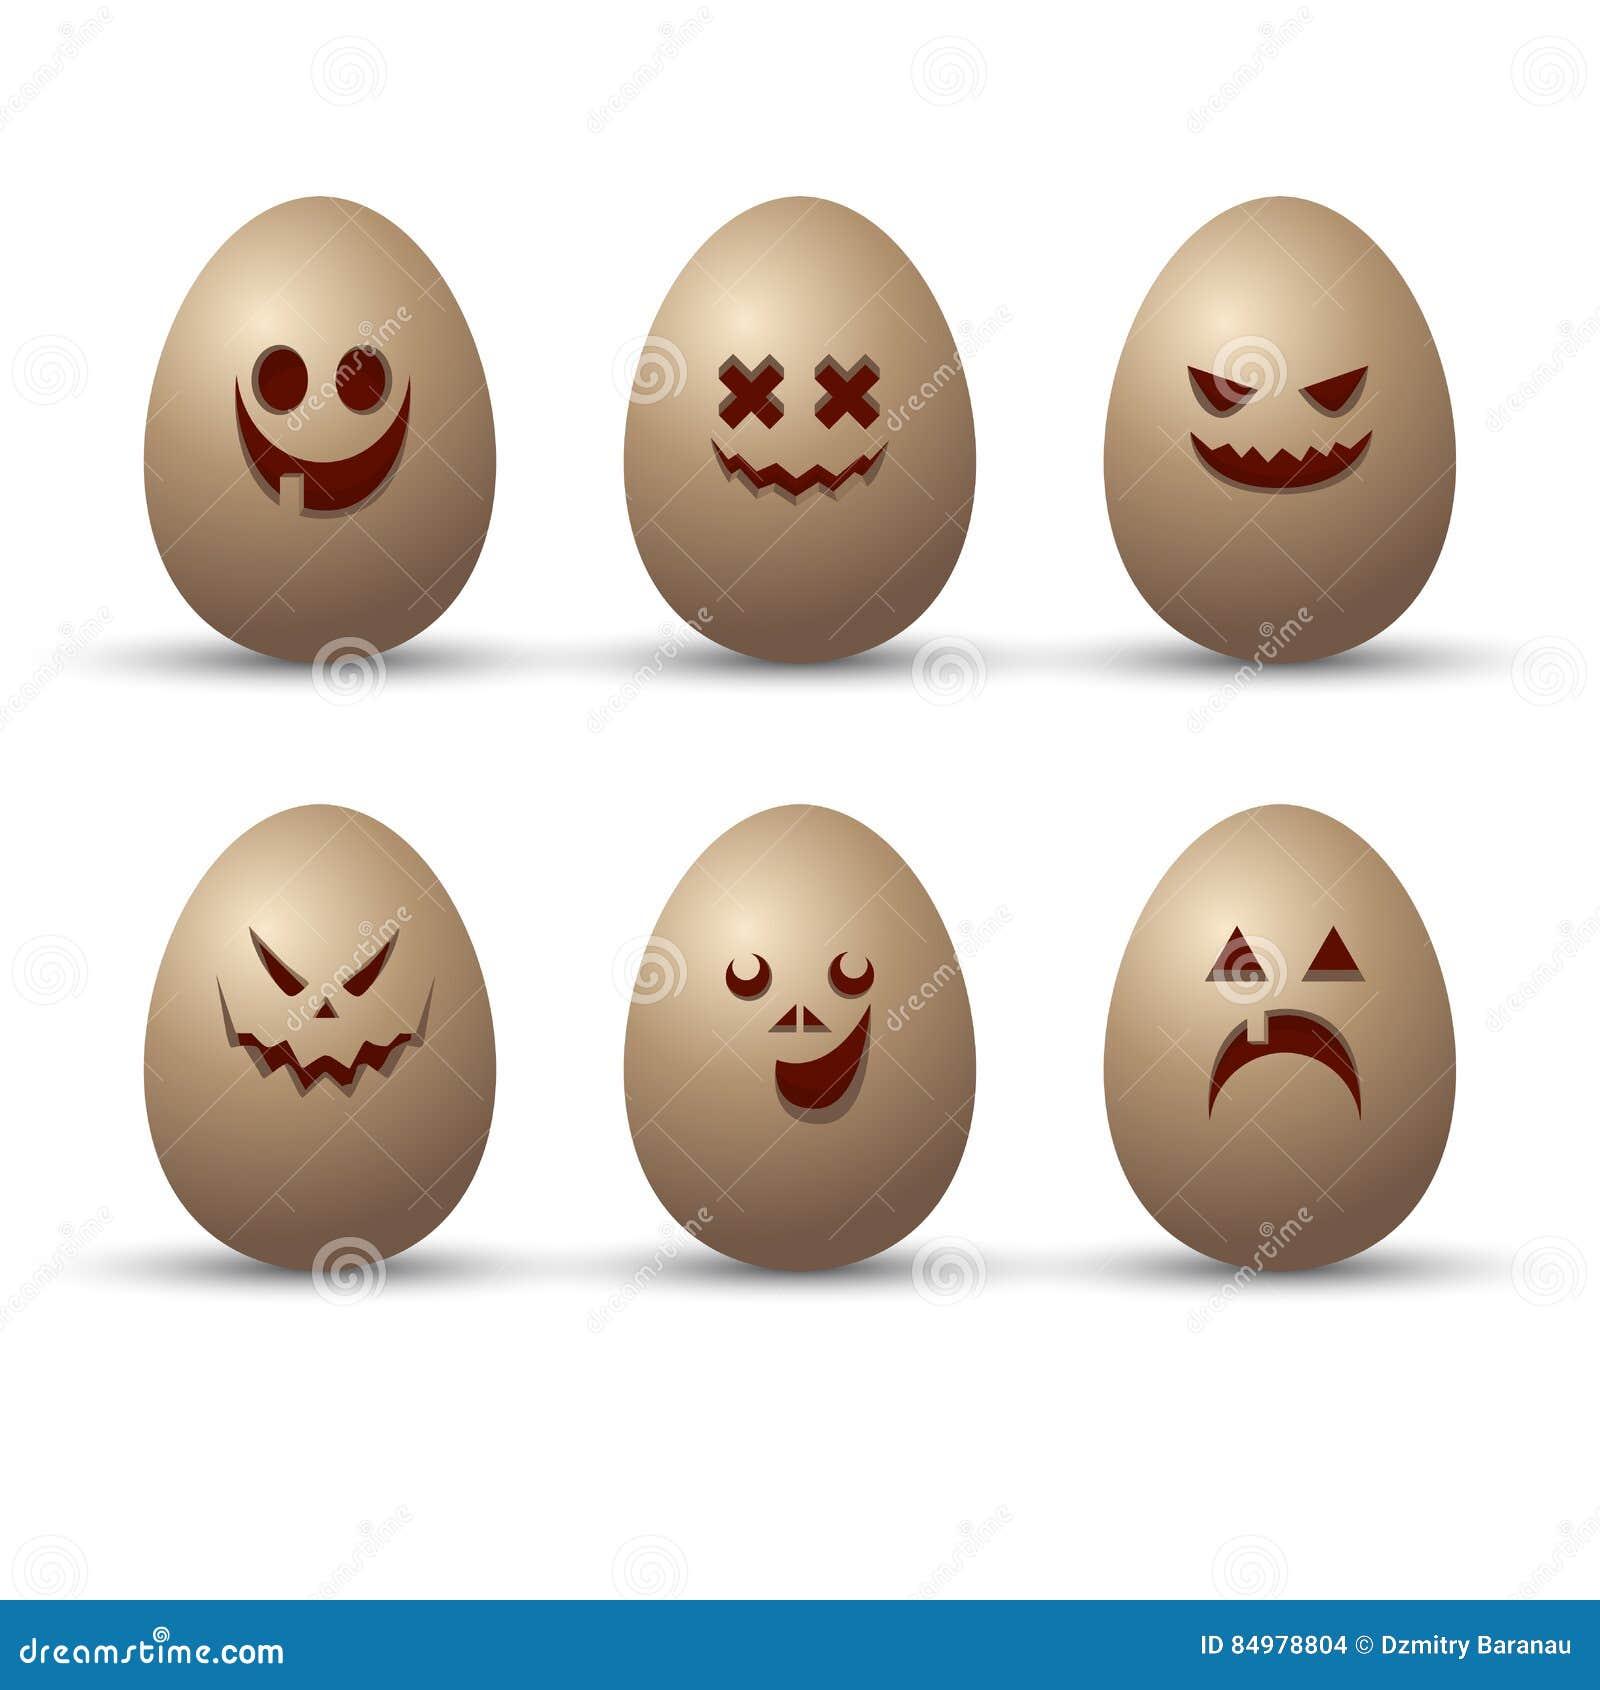 funny eggs emotion mood - photo #40